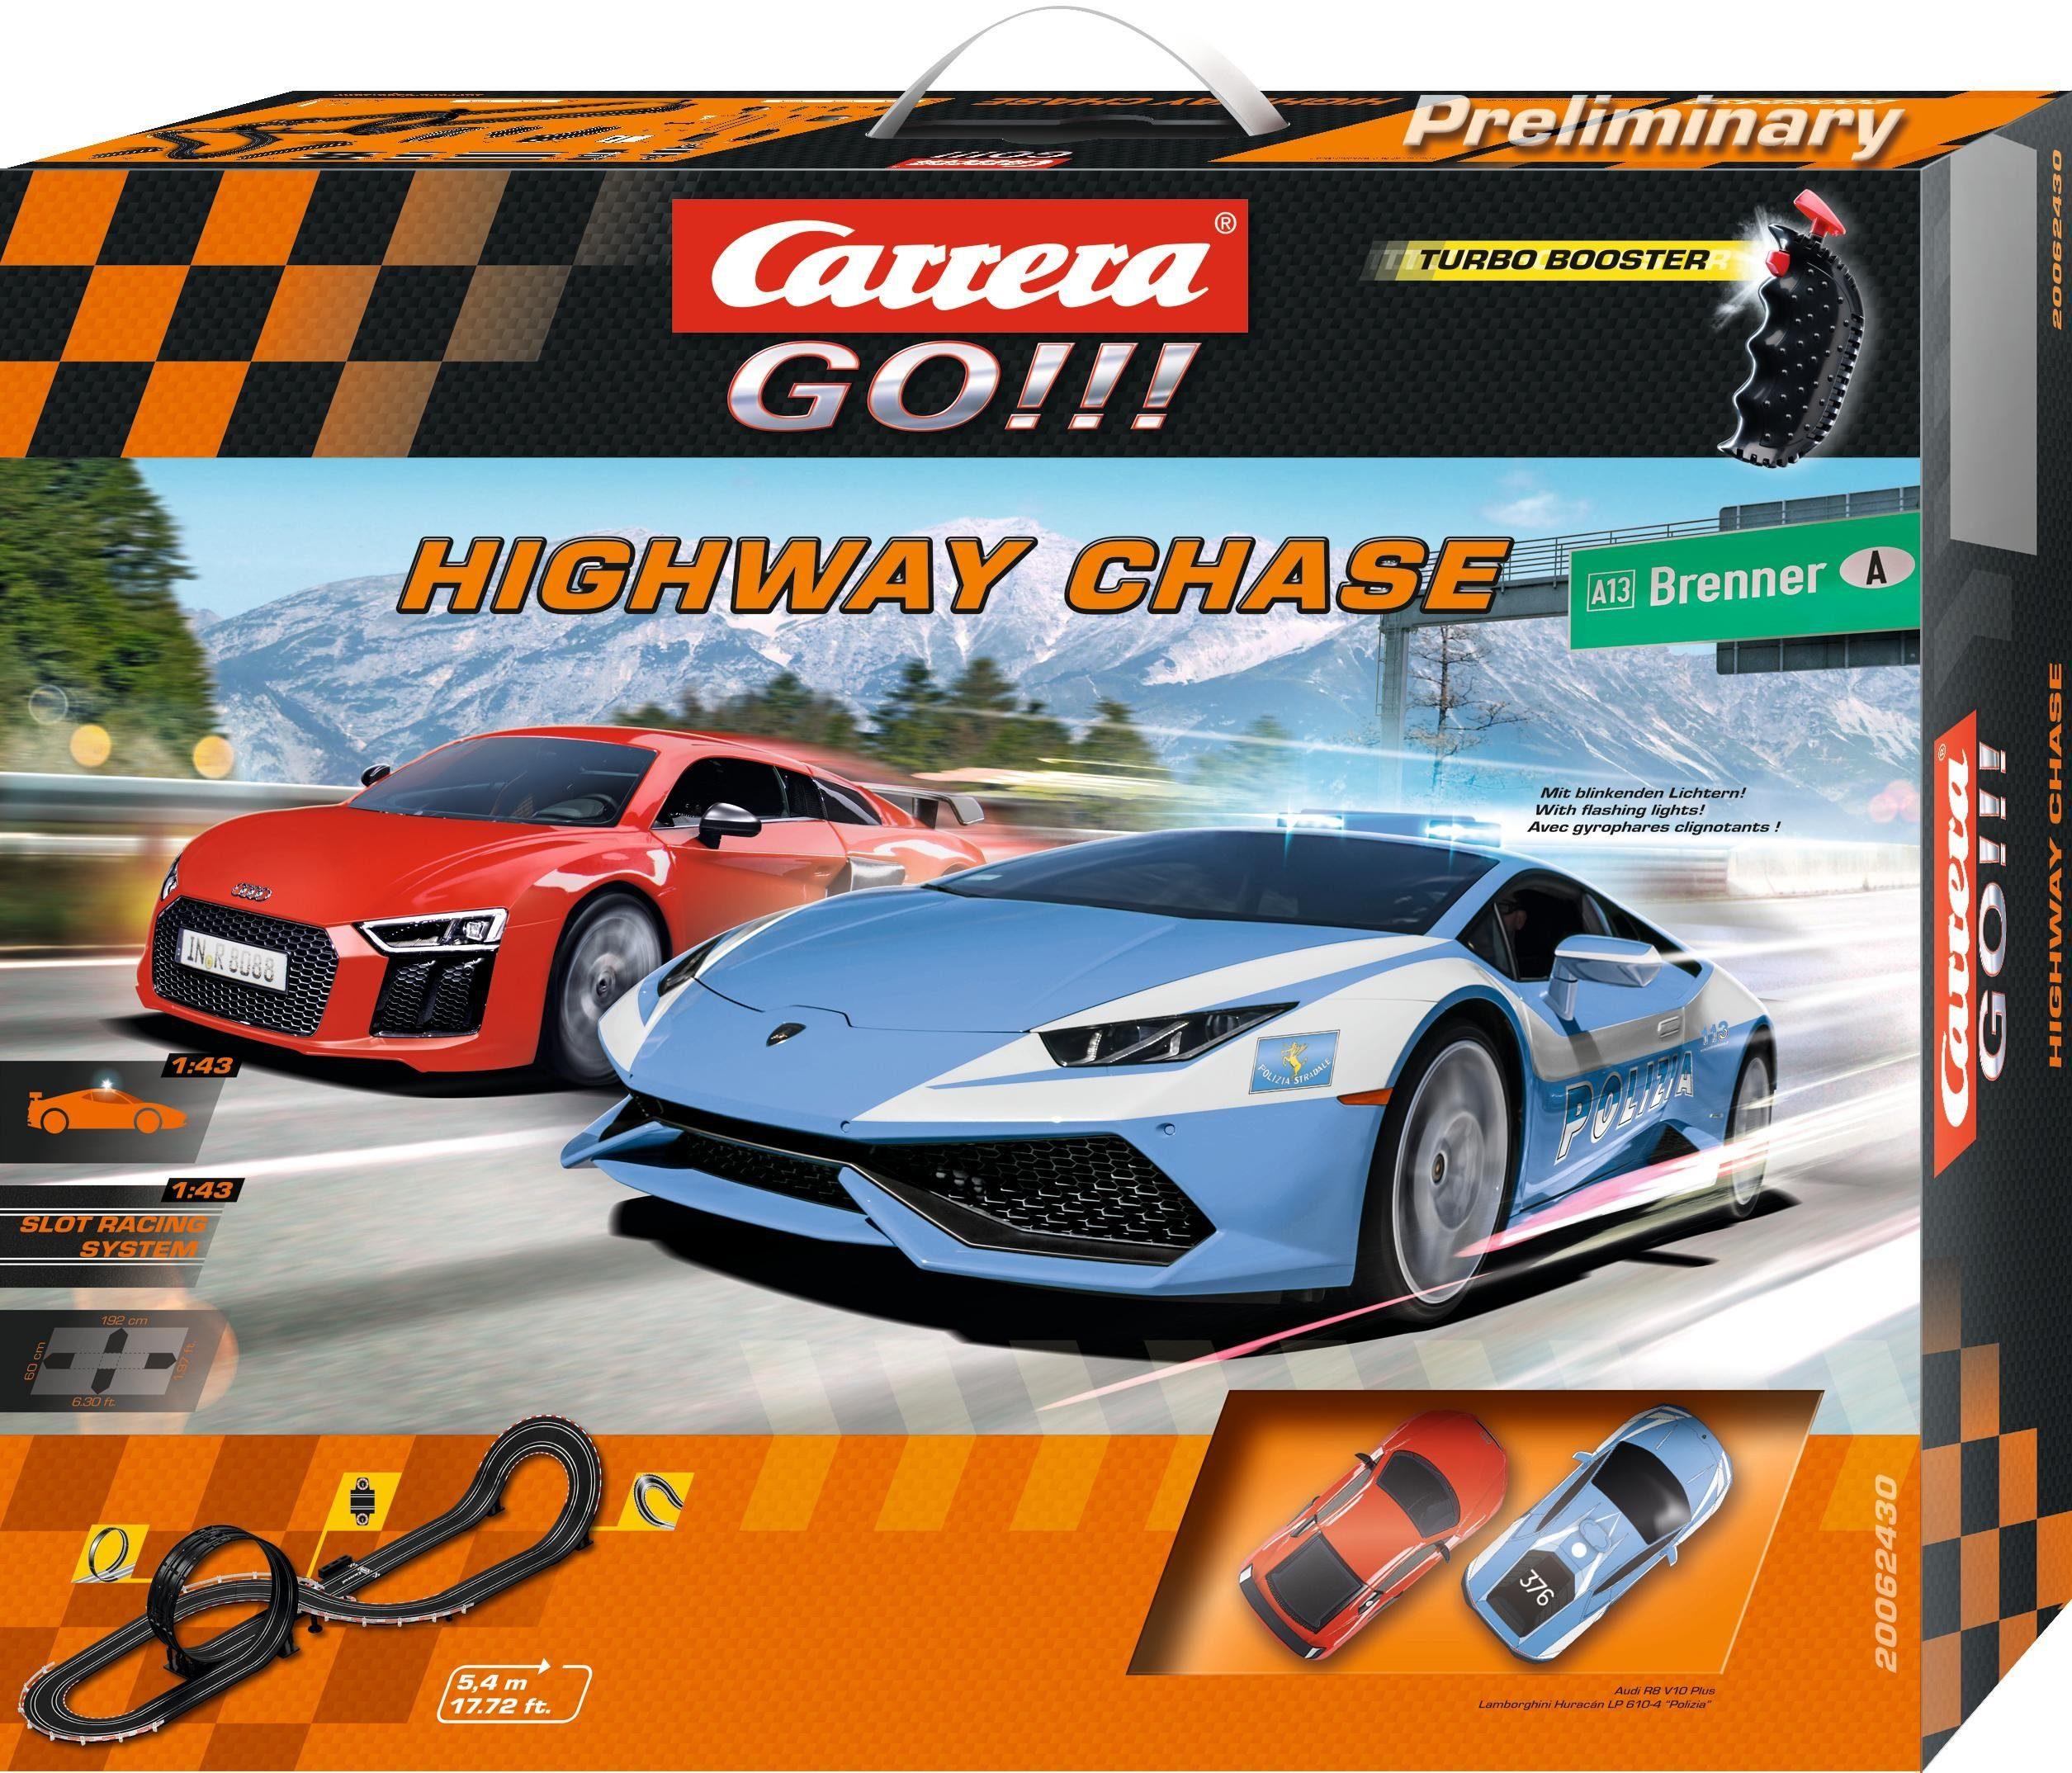 Carrera Autorennbahn, »Carrera® GO!!! Highway Chase«